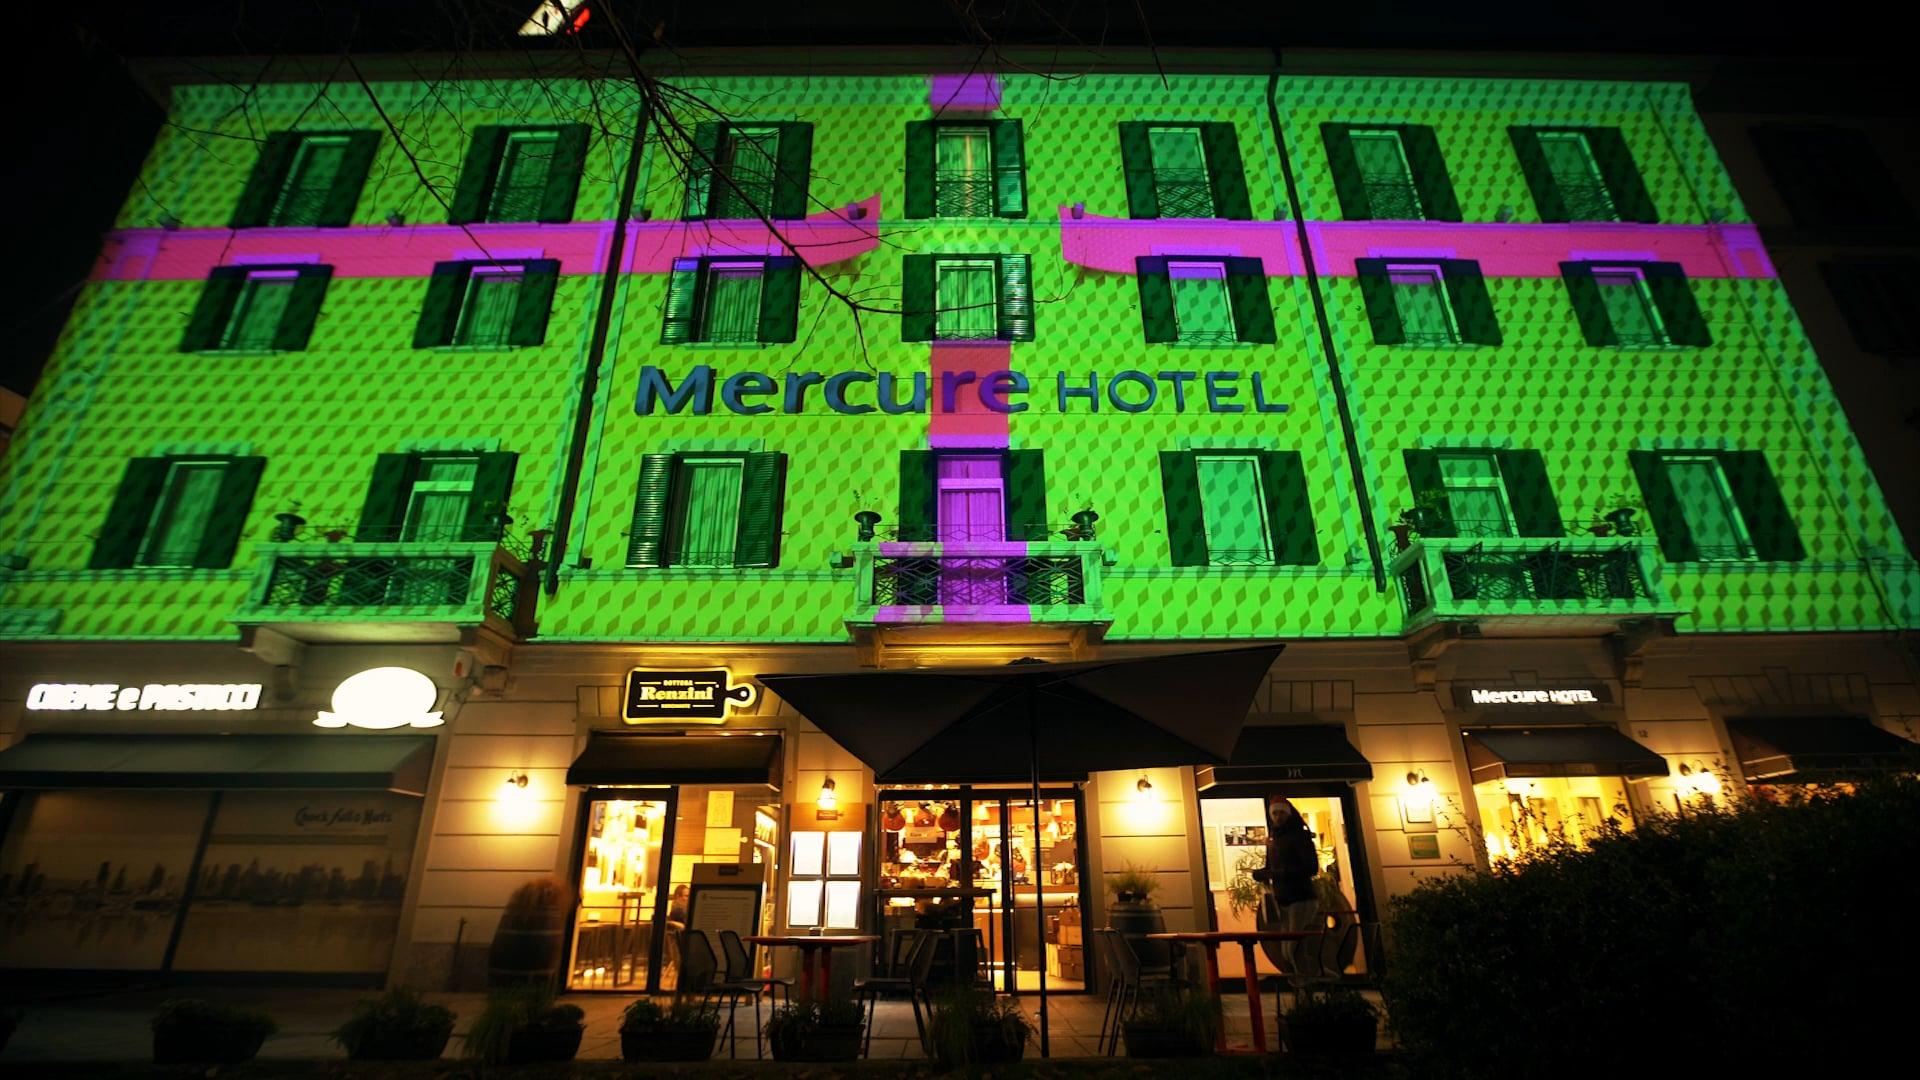 Mercure - Christmas Story